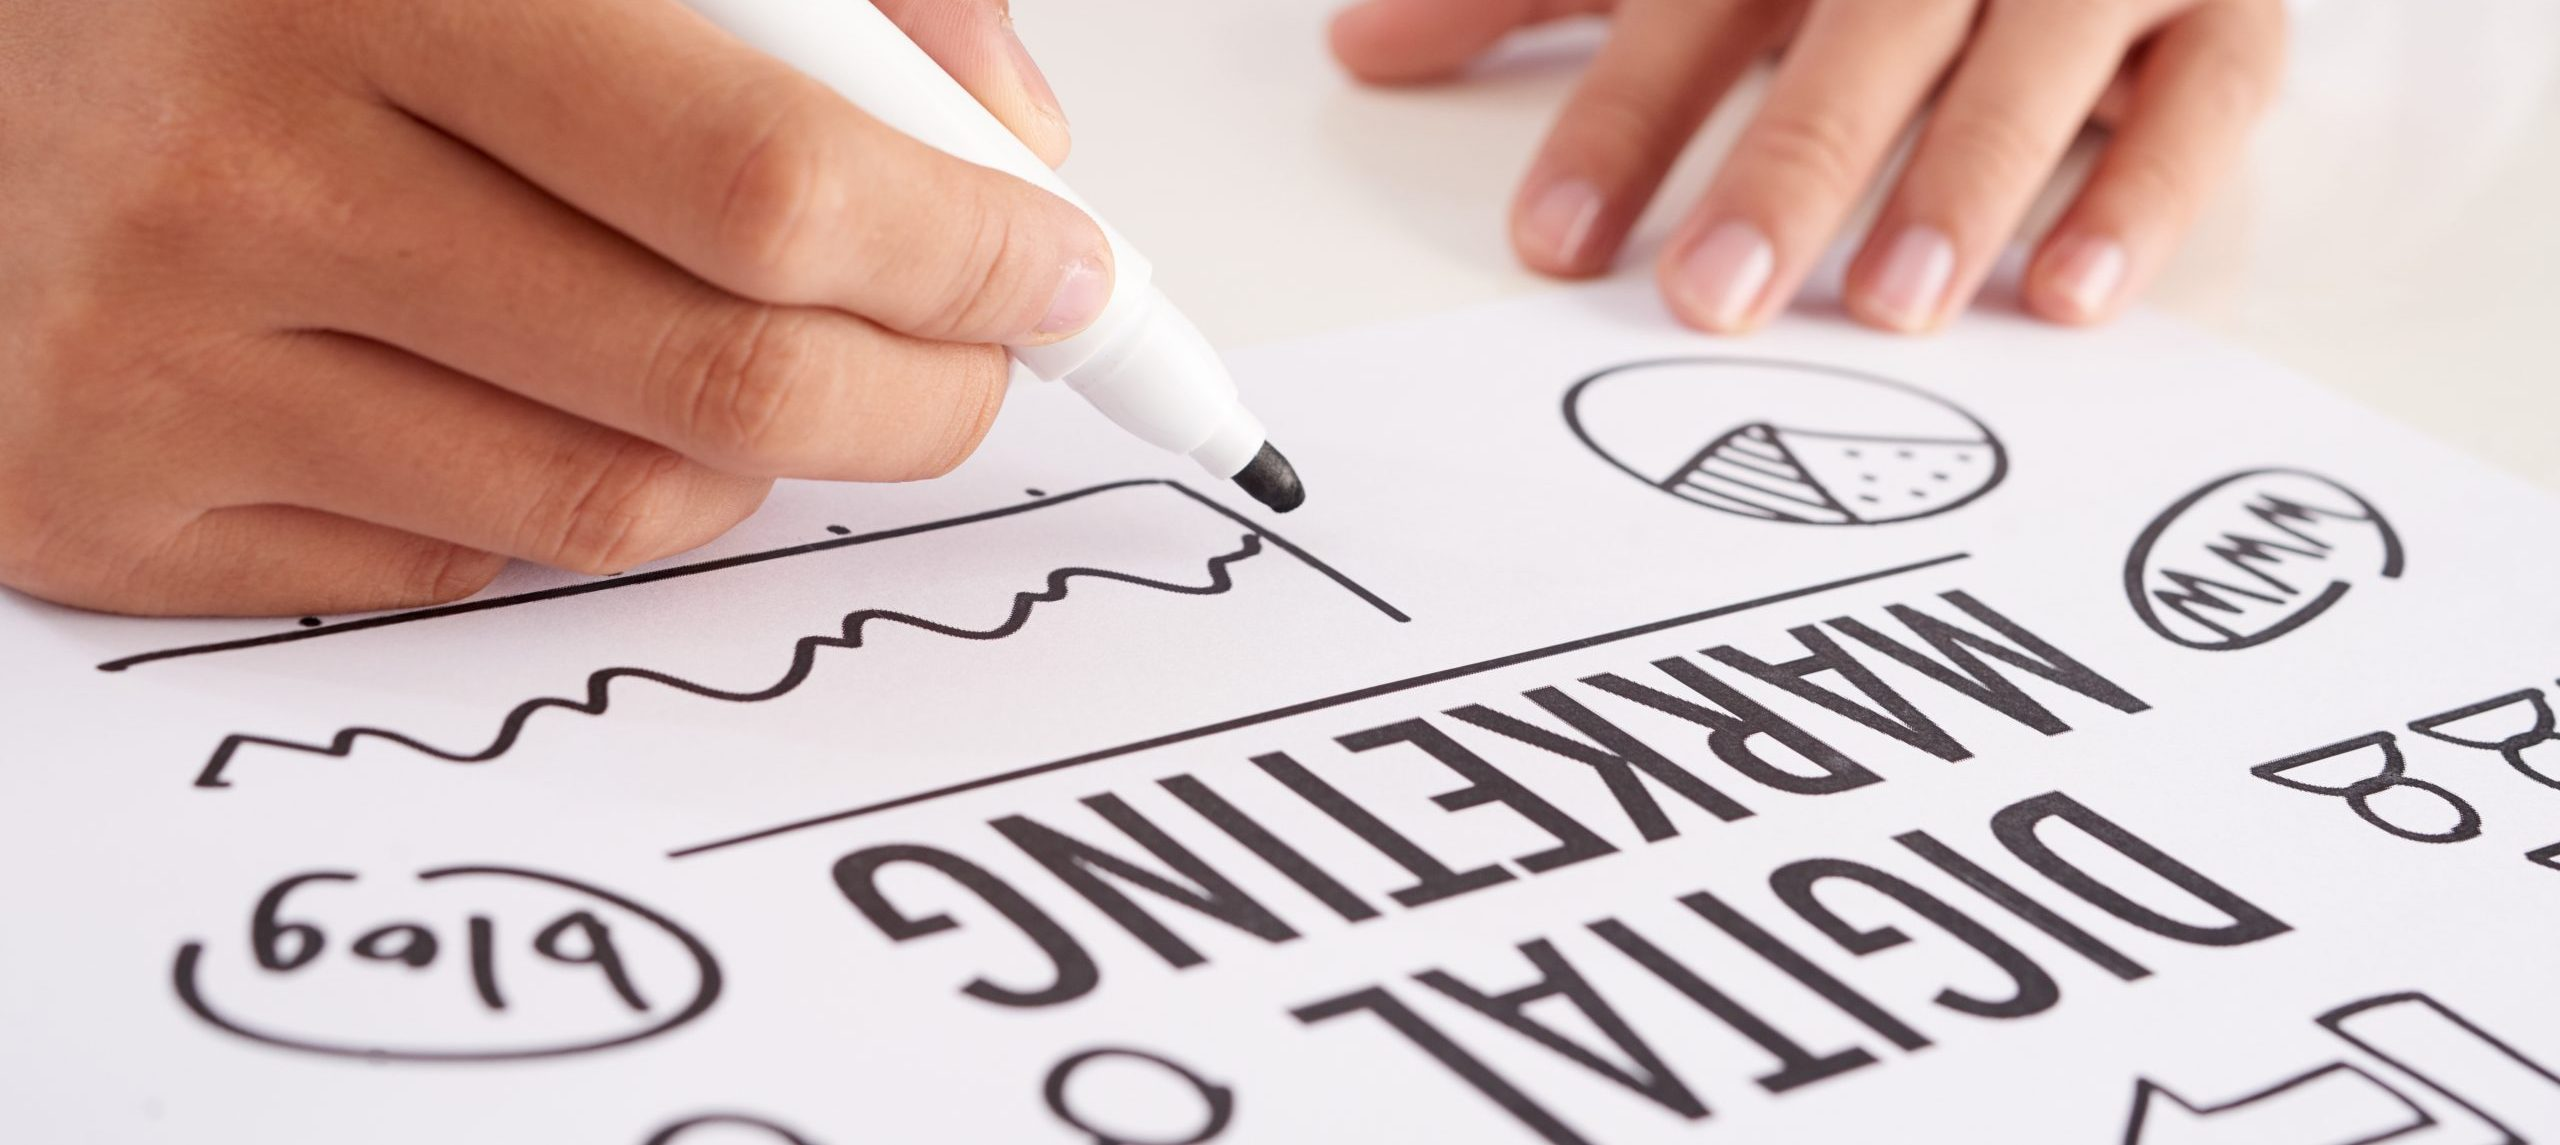 COVID-19 Impact on Business / Digital Marketing Initiatives